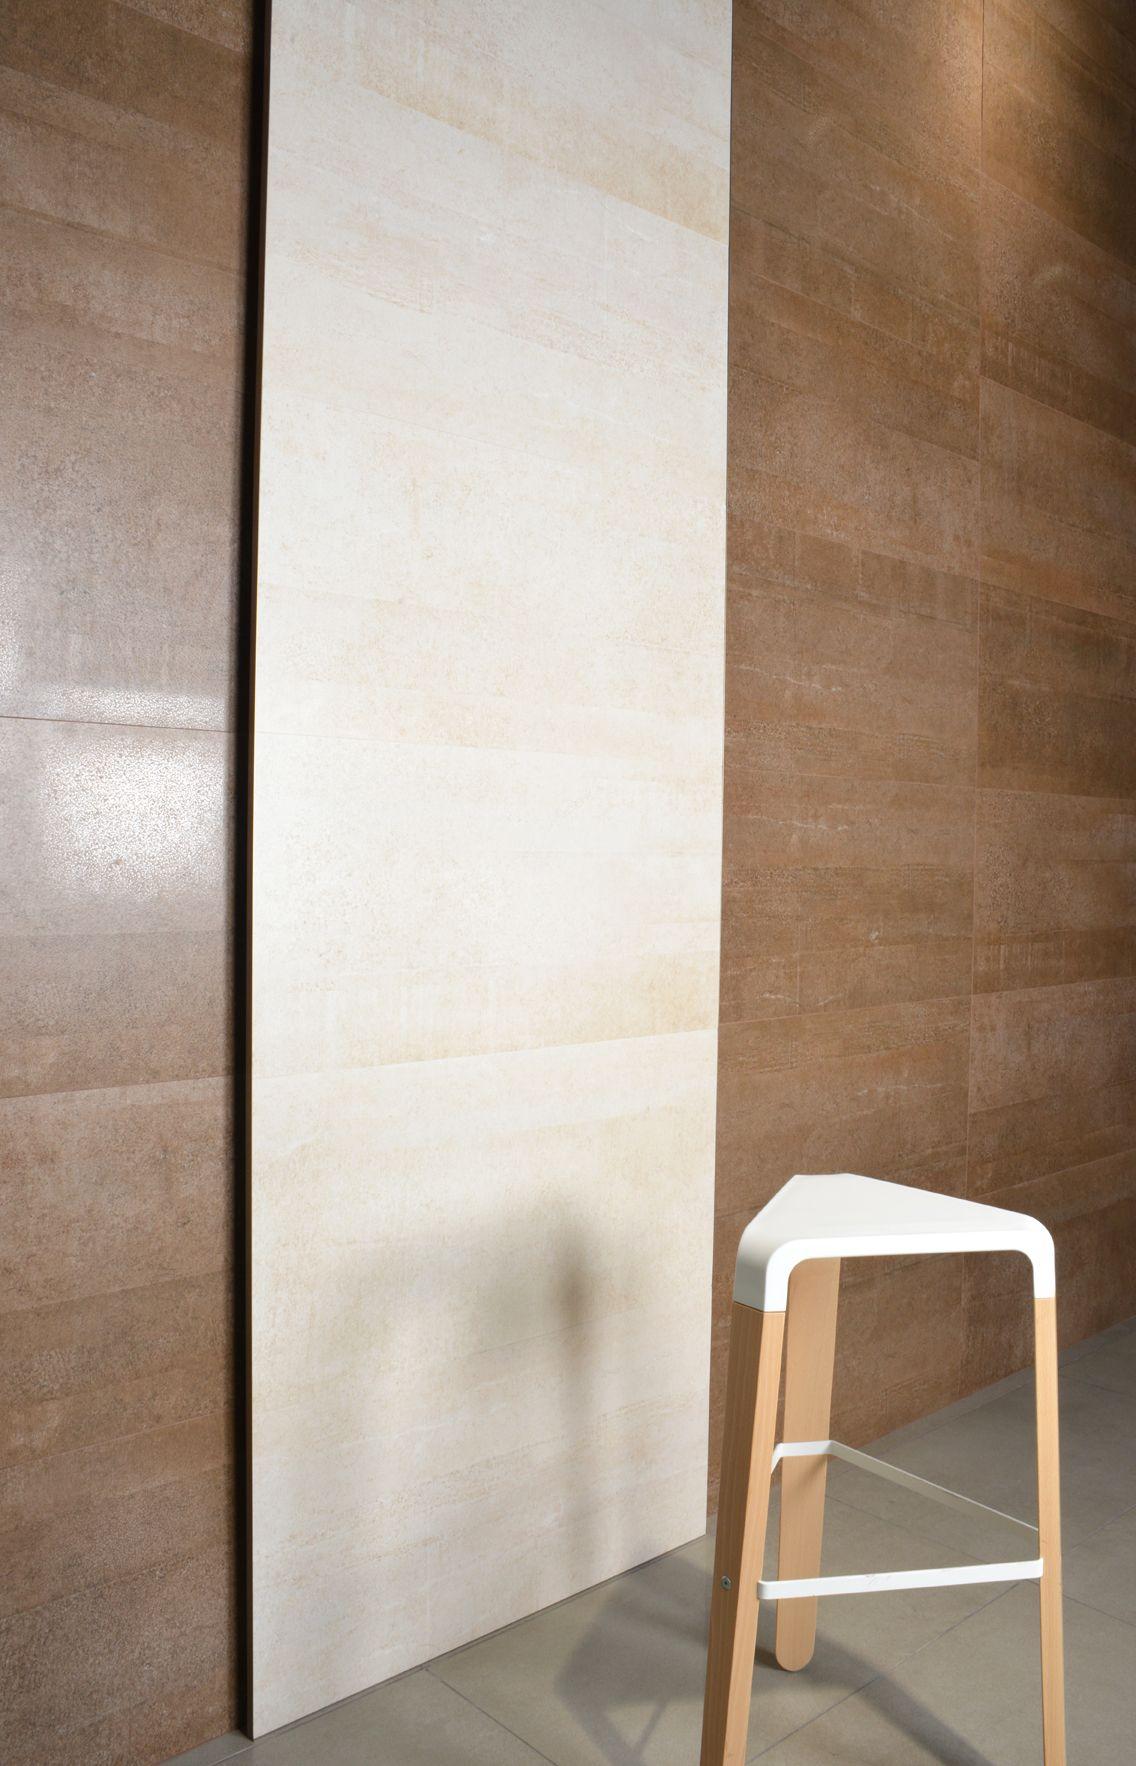 Colección Beton. Disponible en 30x60, 60x60, 22.5x90 y 45x90 cm. #beton #marron #sable #tauceramica #ceramica #tile #porcelanico #porcelaintile #revestimiento #walltile #interiordesign